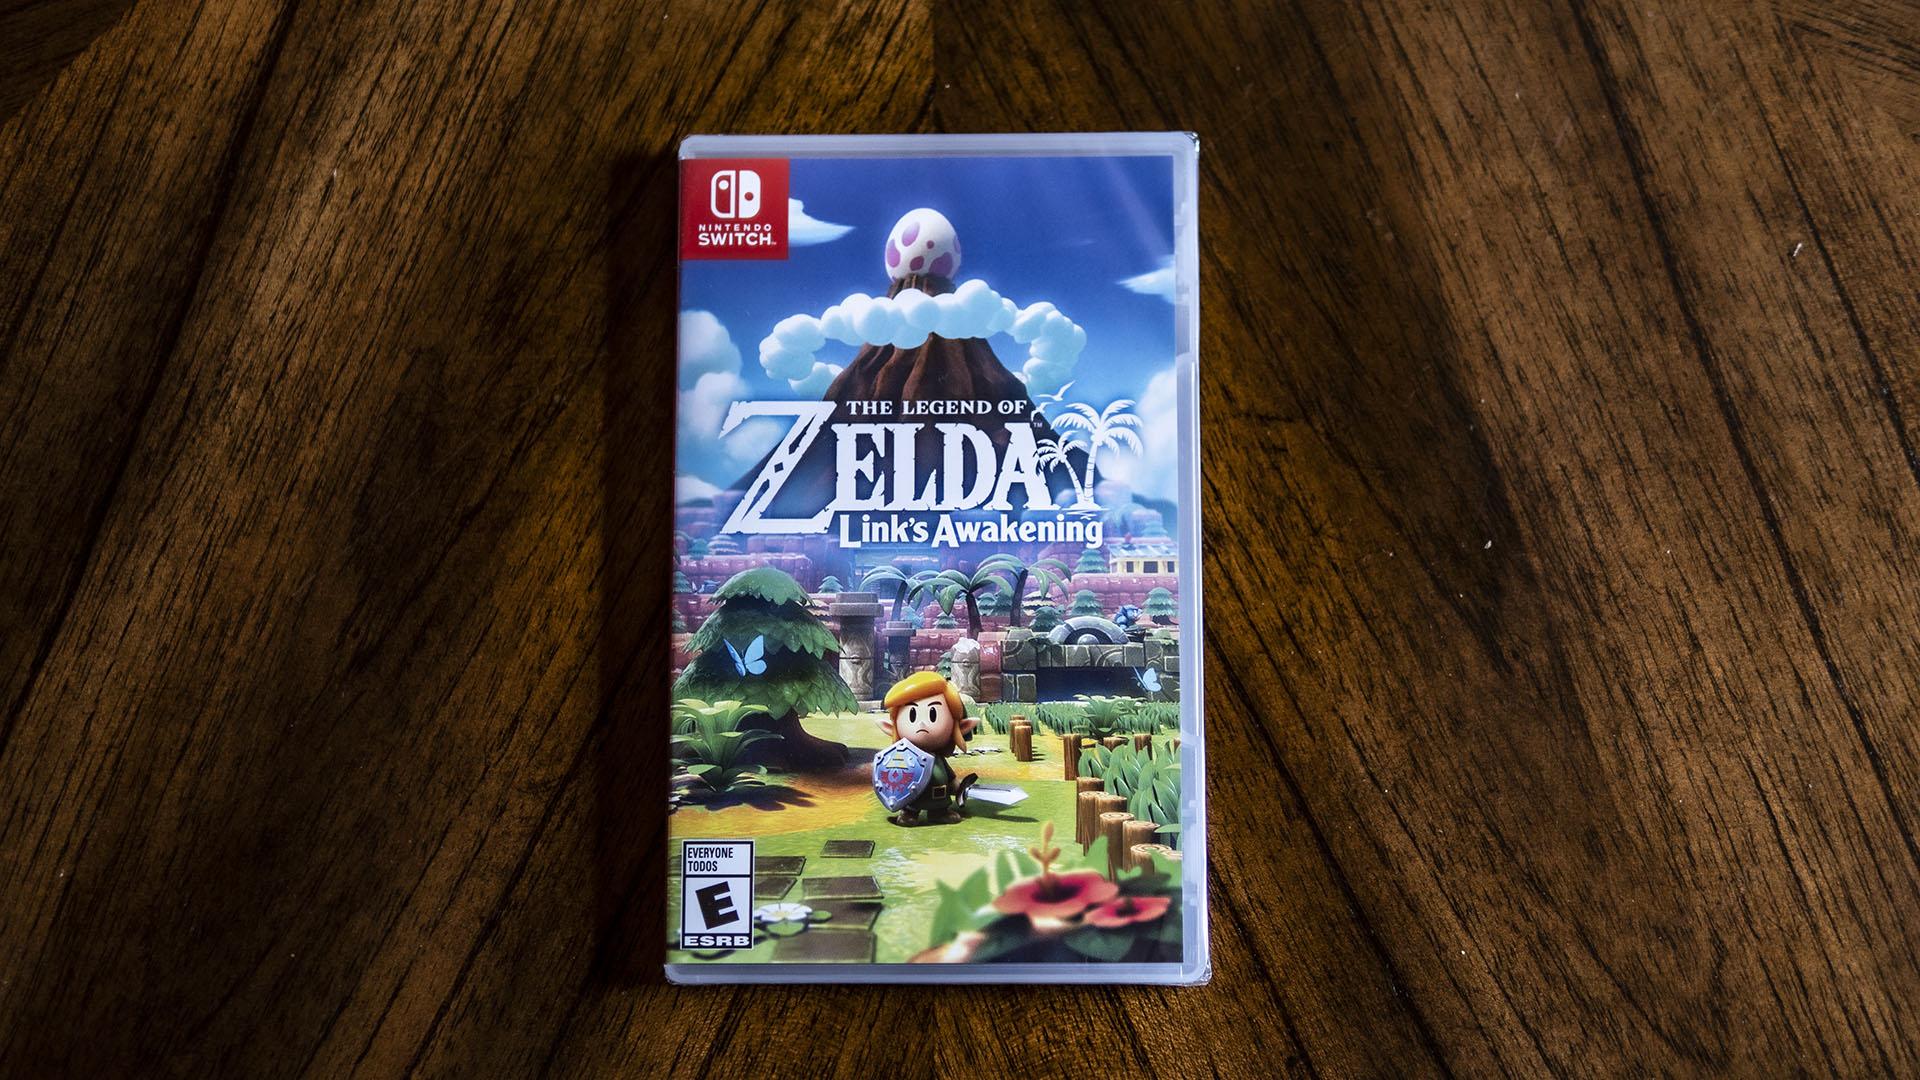 Link's Awakening Switch: Reviews and Analysis